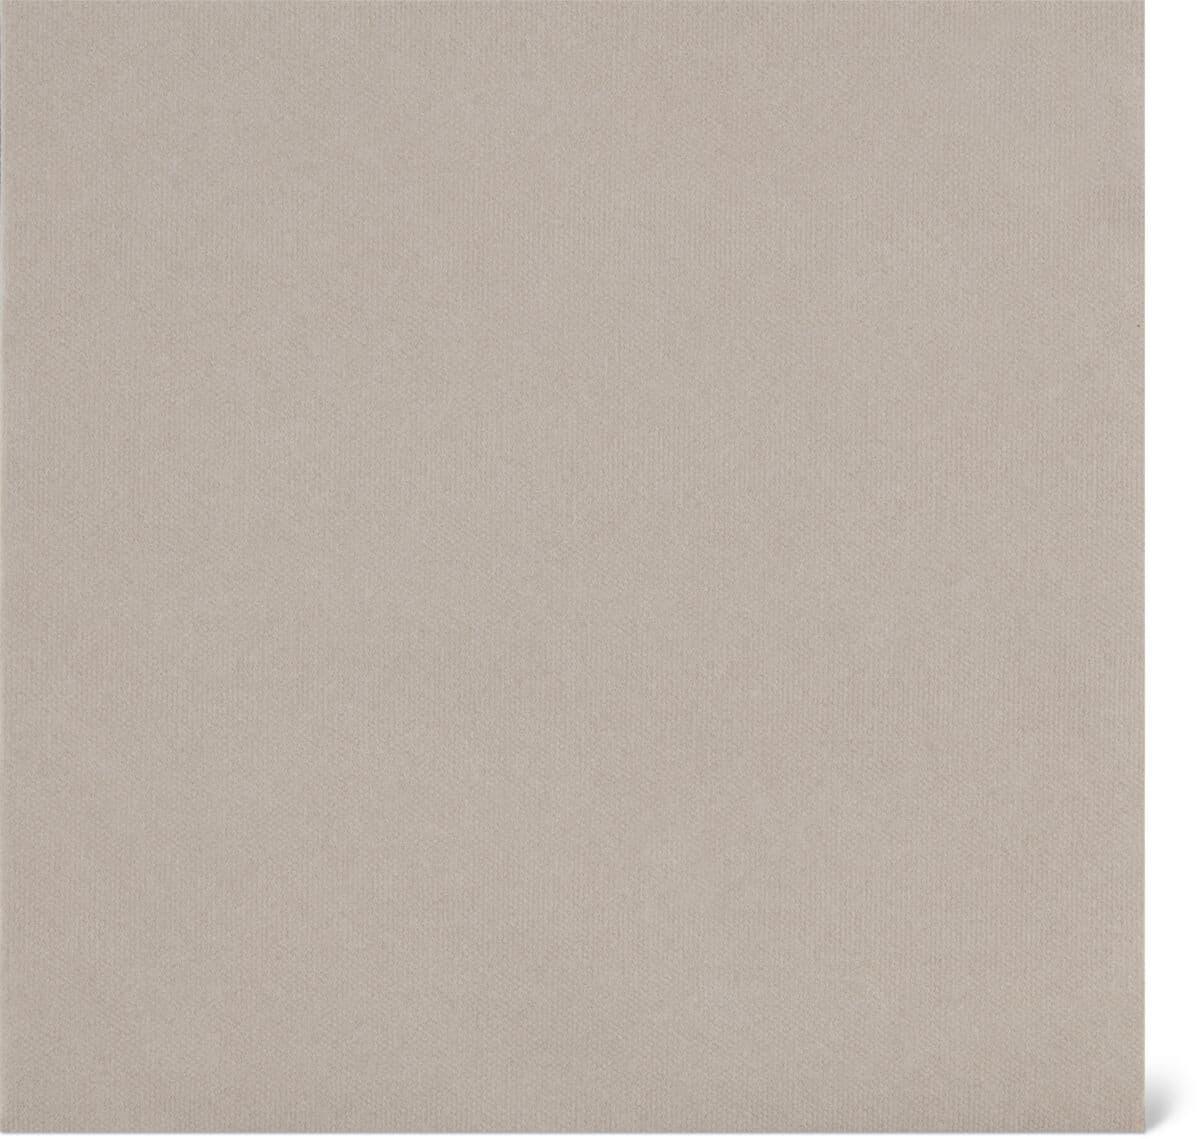 Cucina & Tavola Papierservietten, 40x40cm